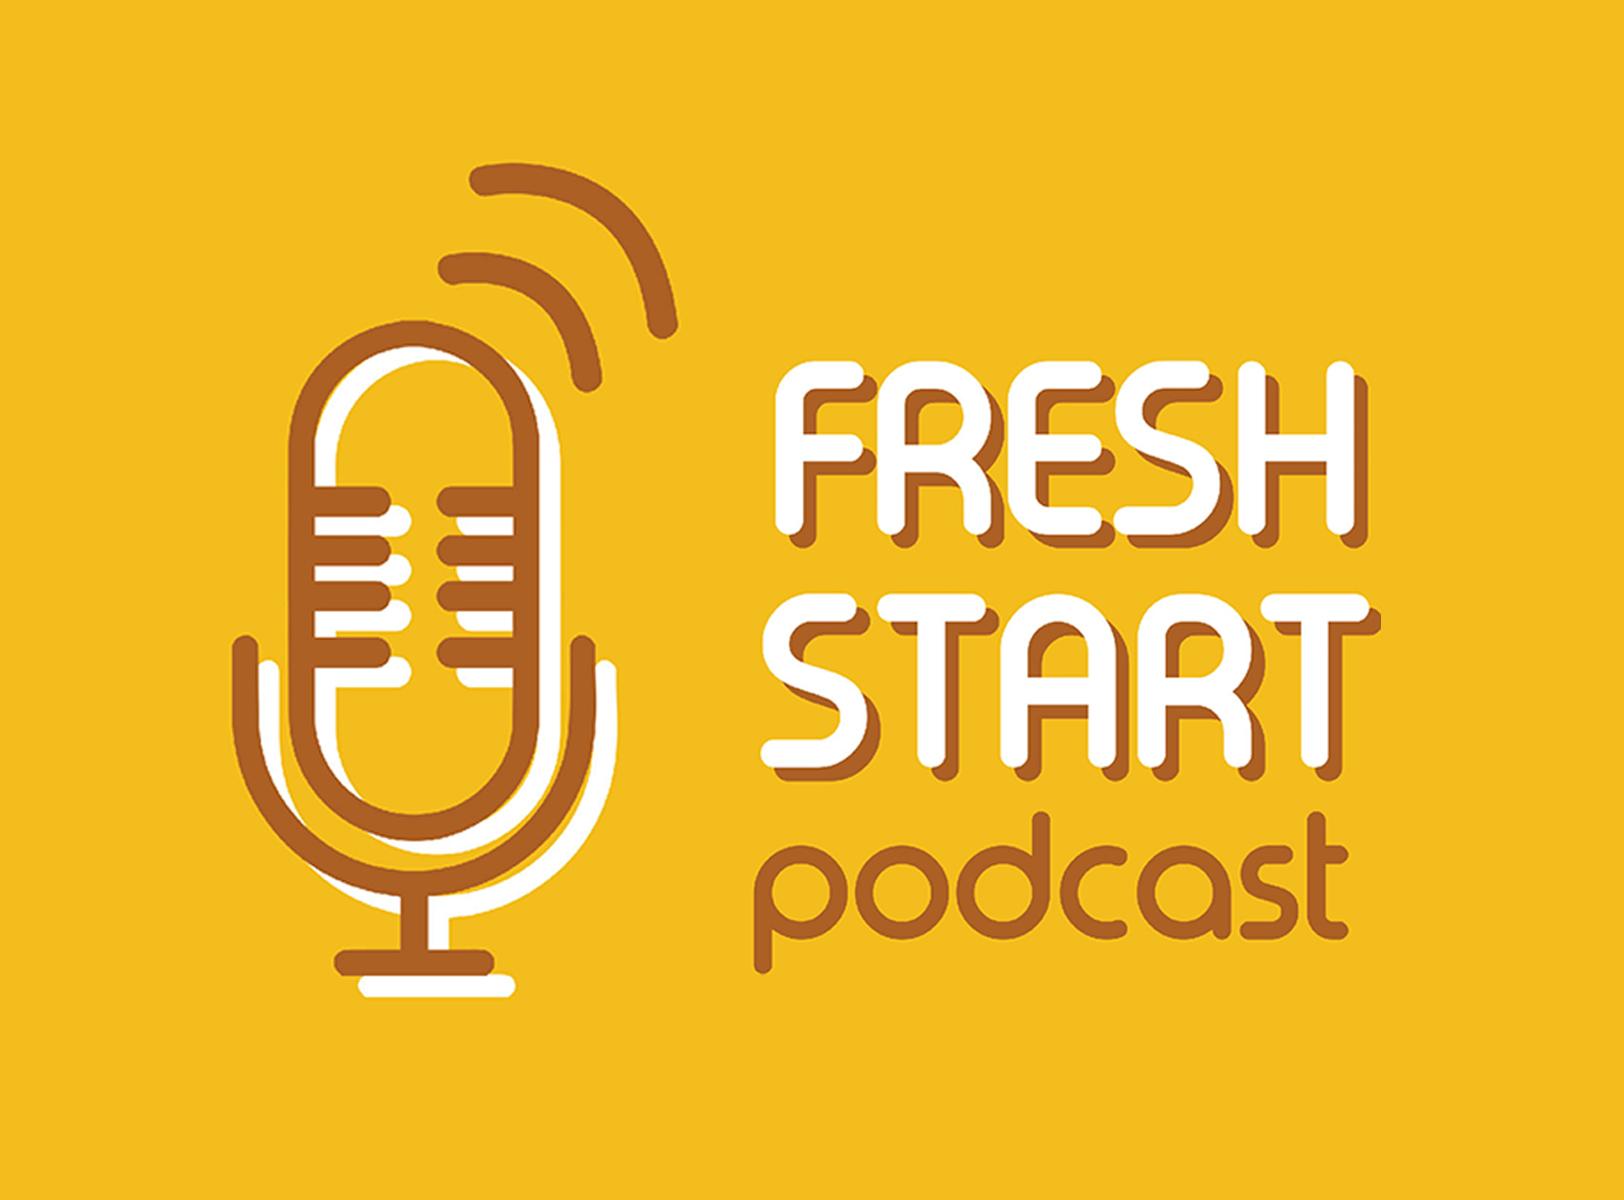 Fresh Start: Podcast News (5/30/2019 Thu.)